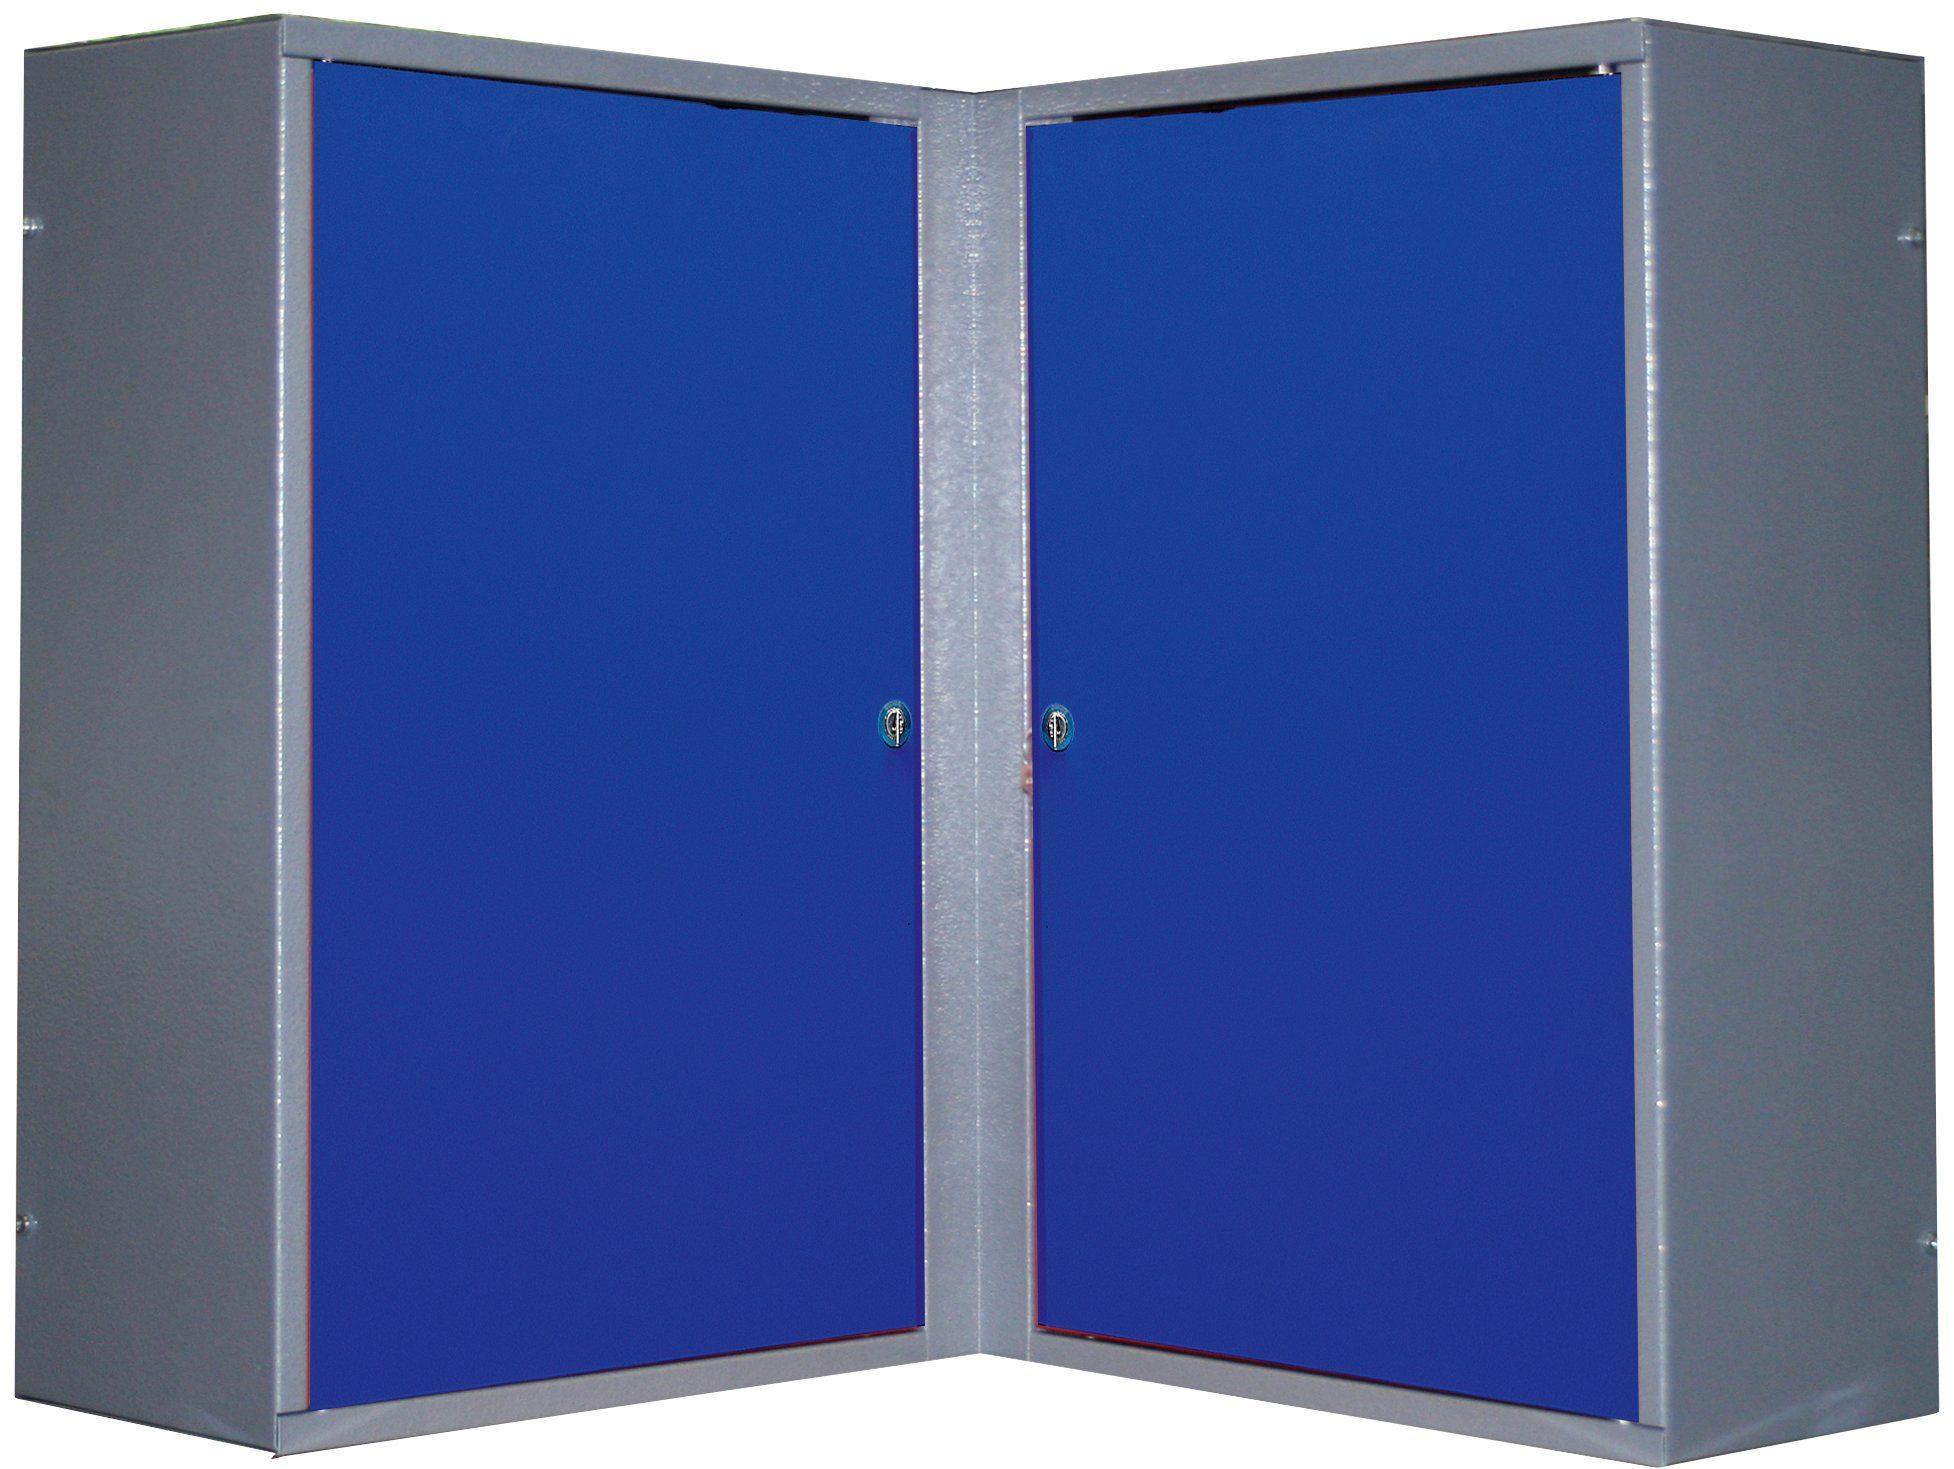 Küpper Eck-Hängeschrank »2 Türen, 4 Einlegeböden, in ultramarinblau«